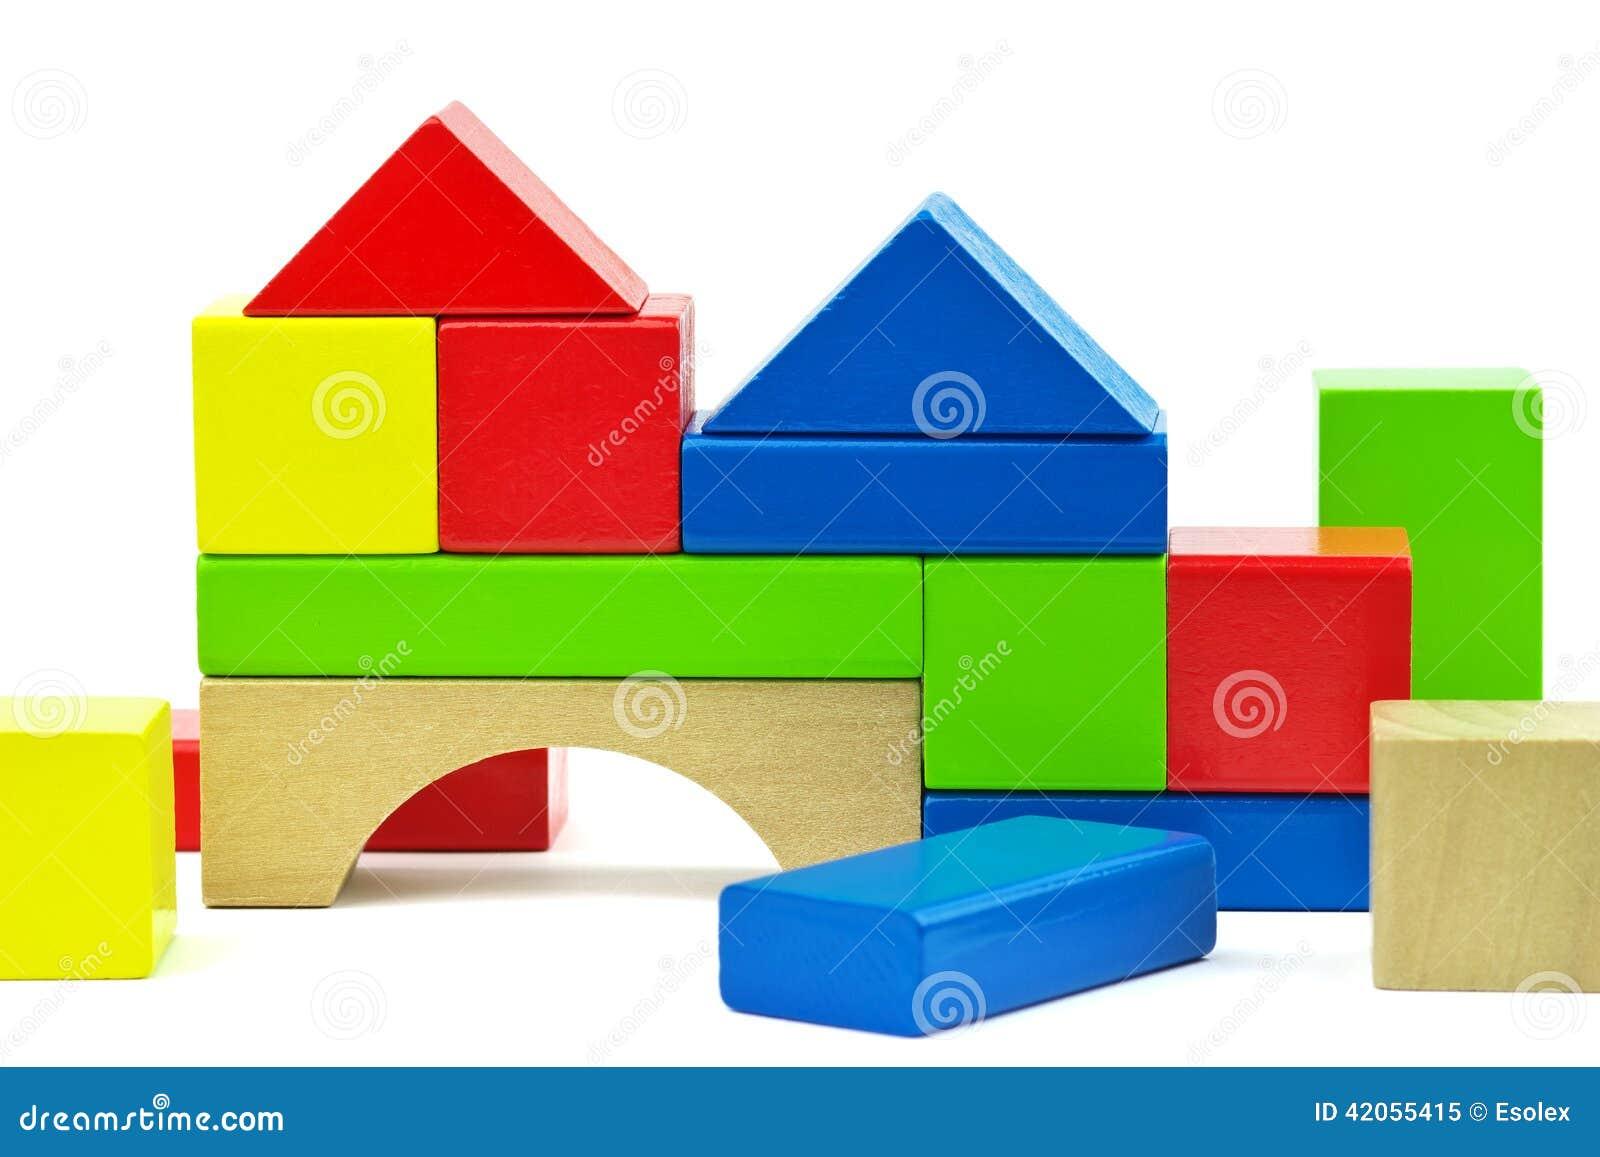 House Building Blocks Toy Videos